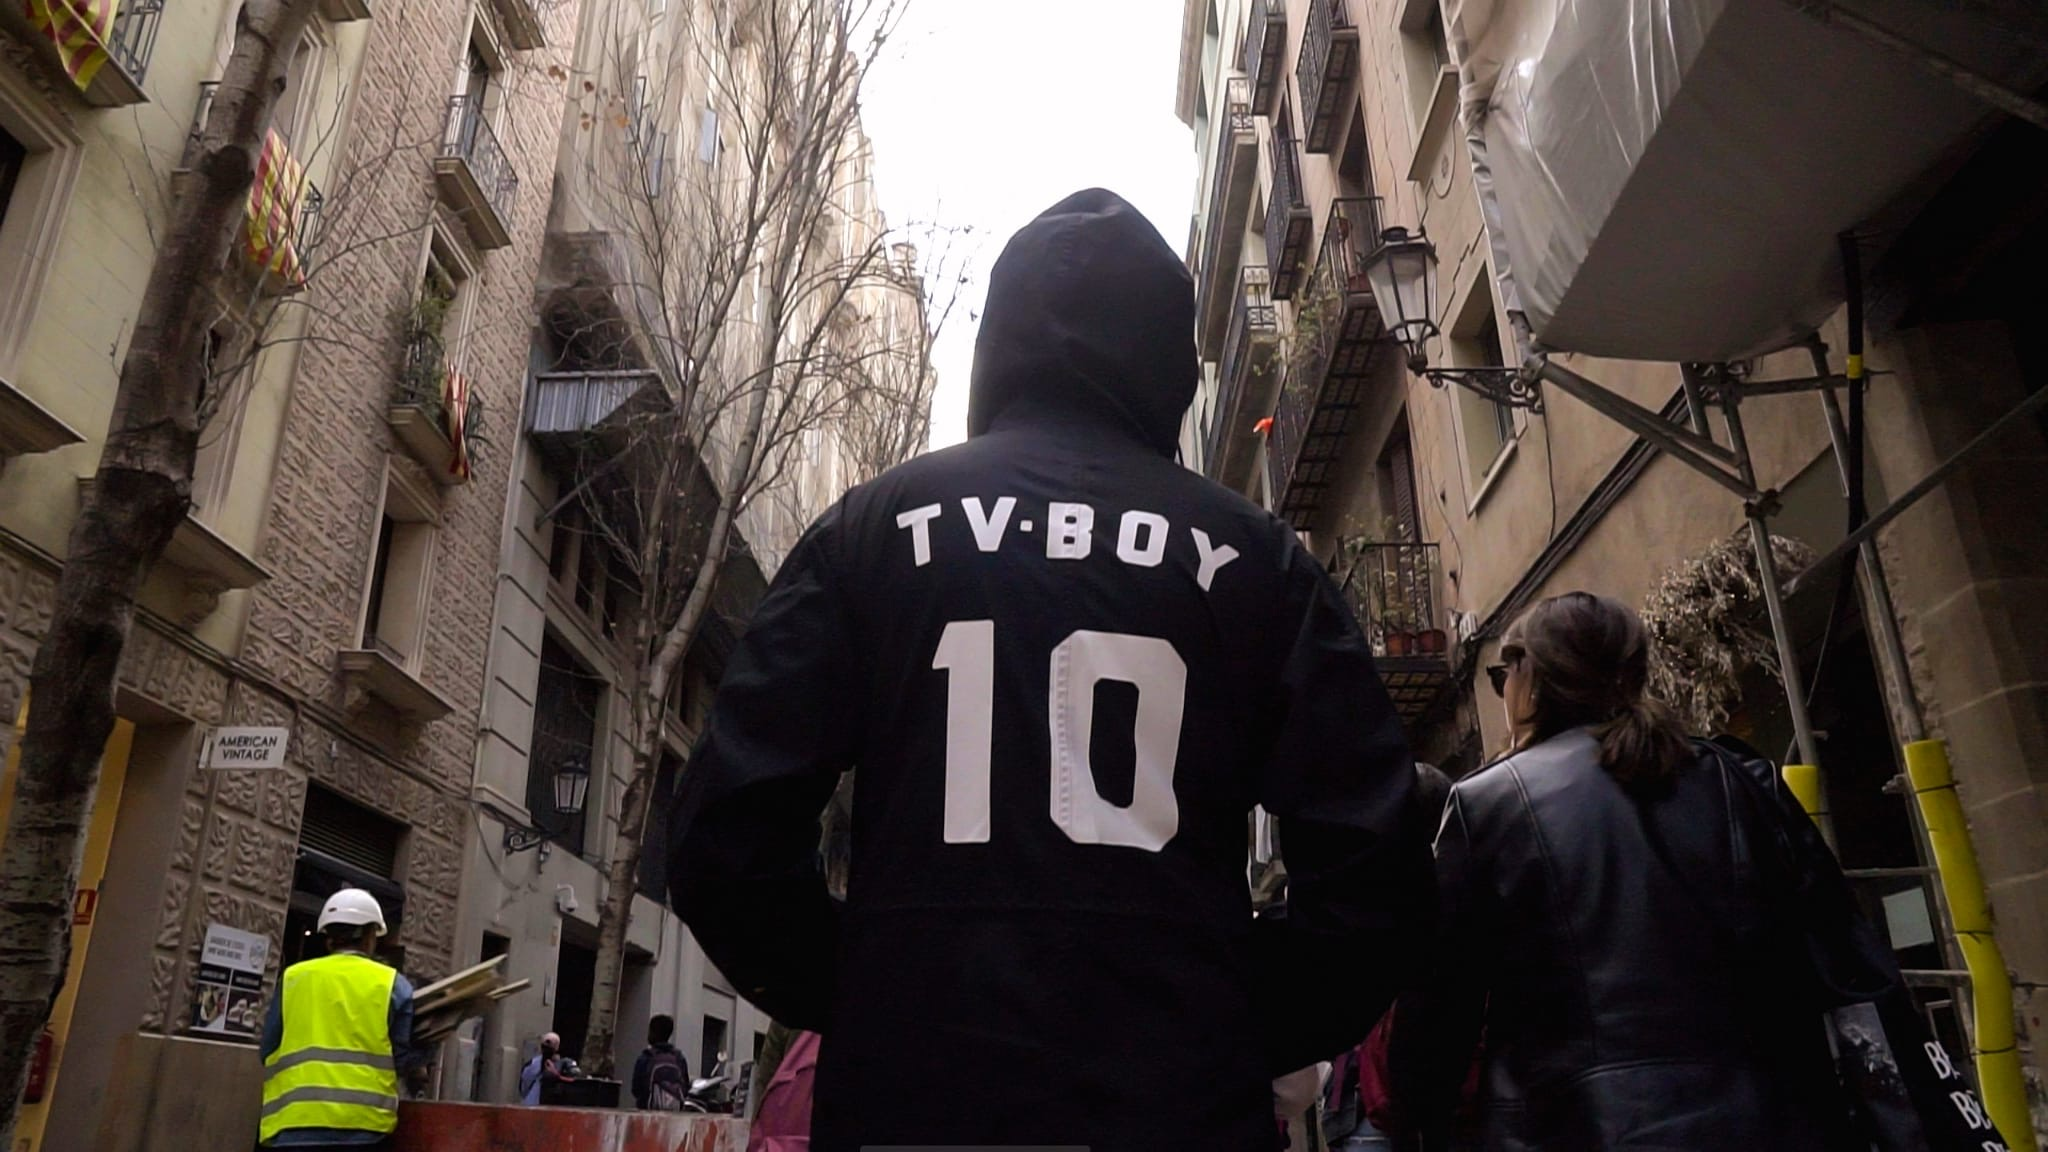 Tvboy